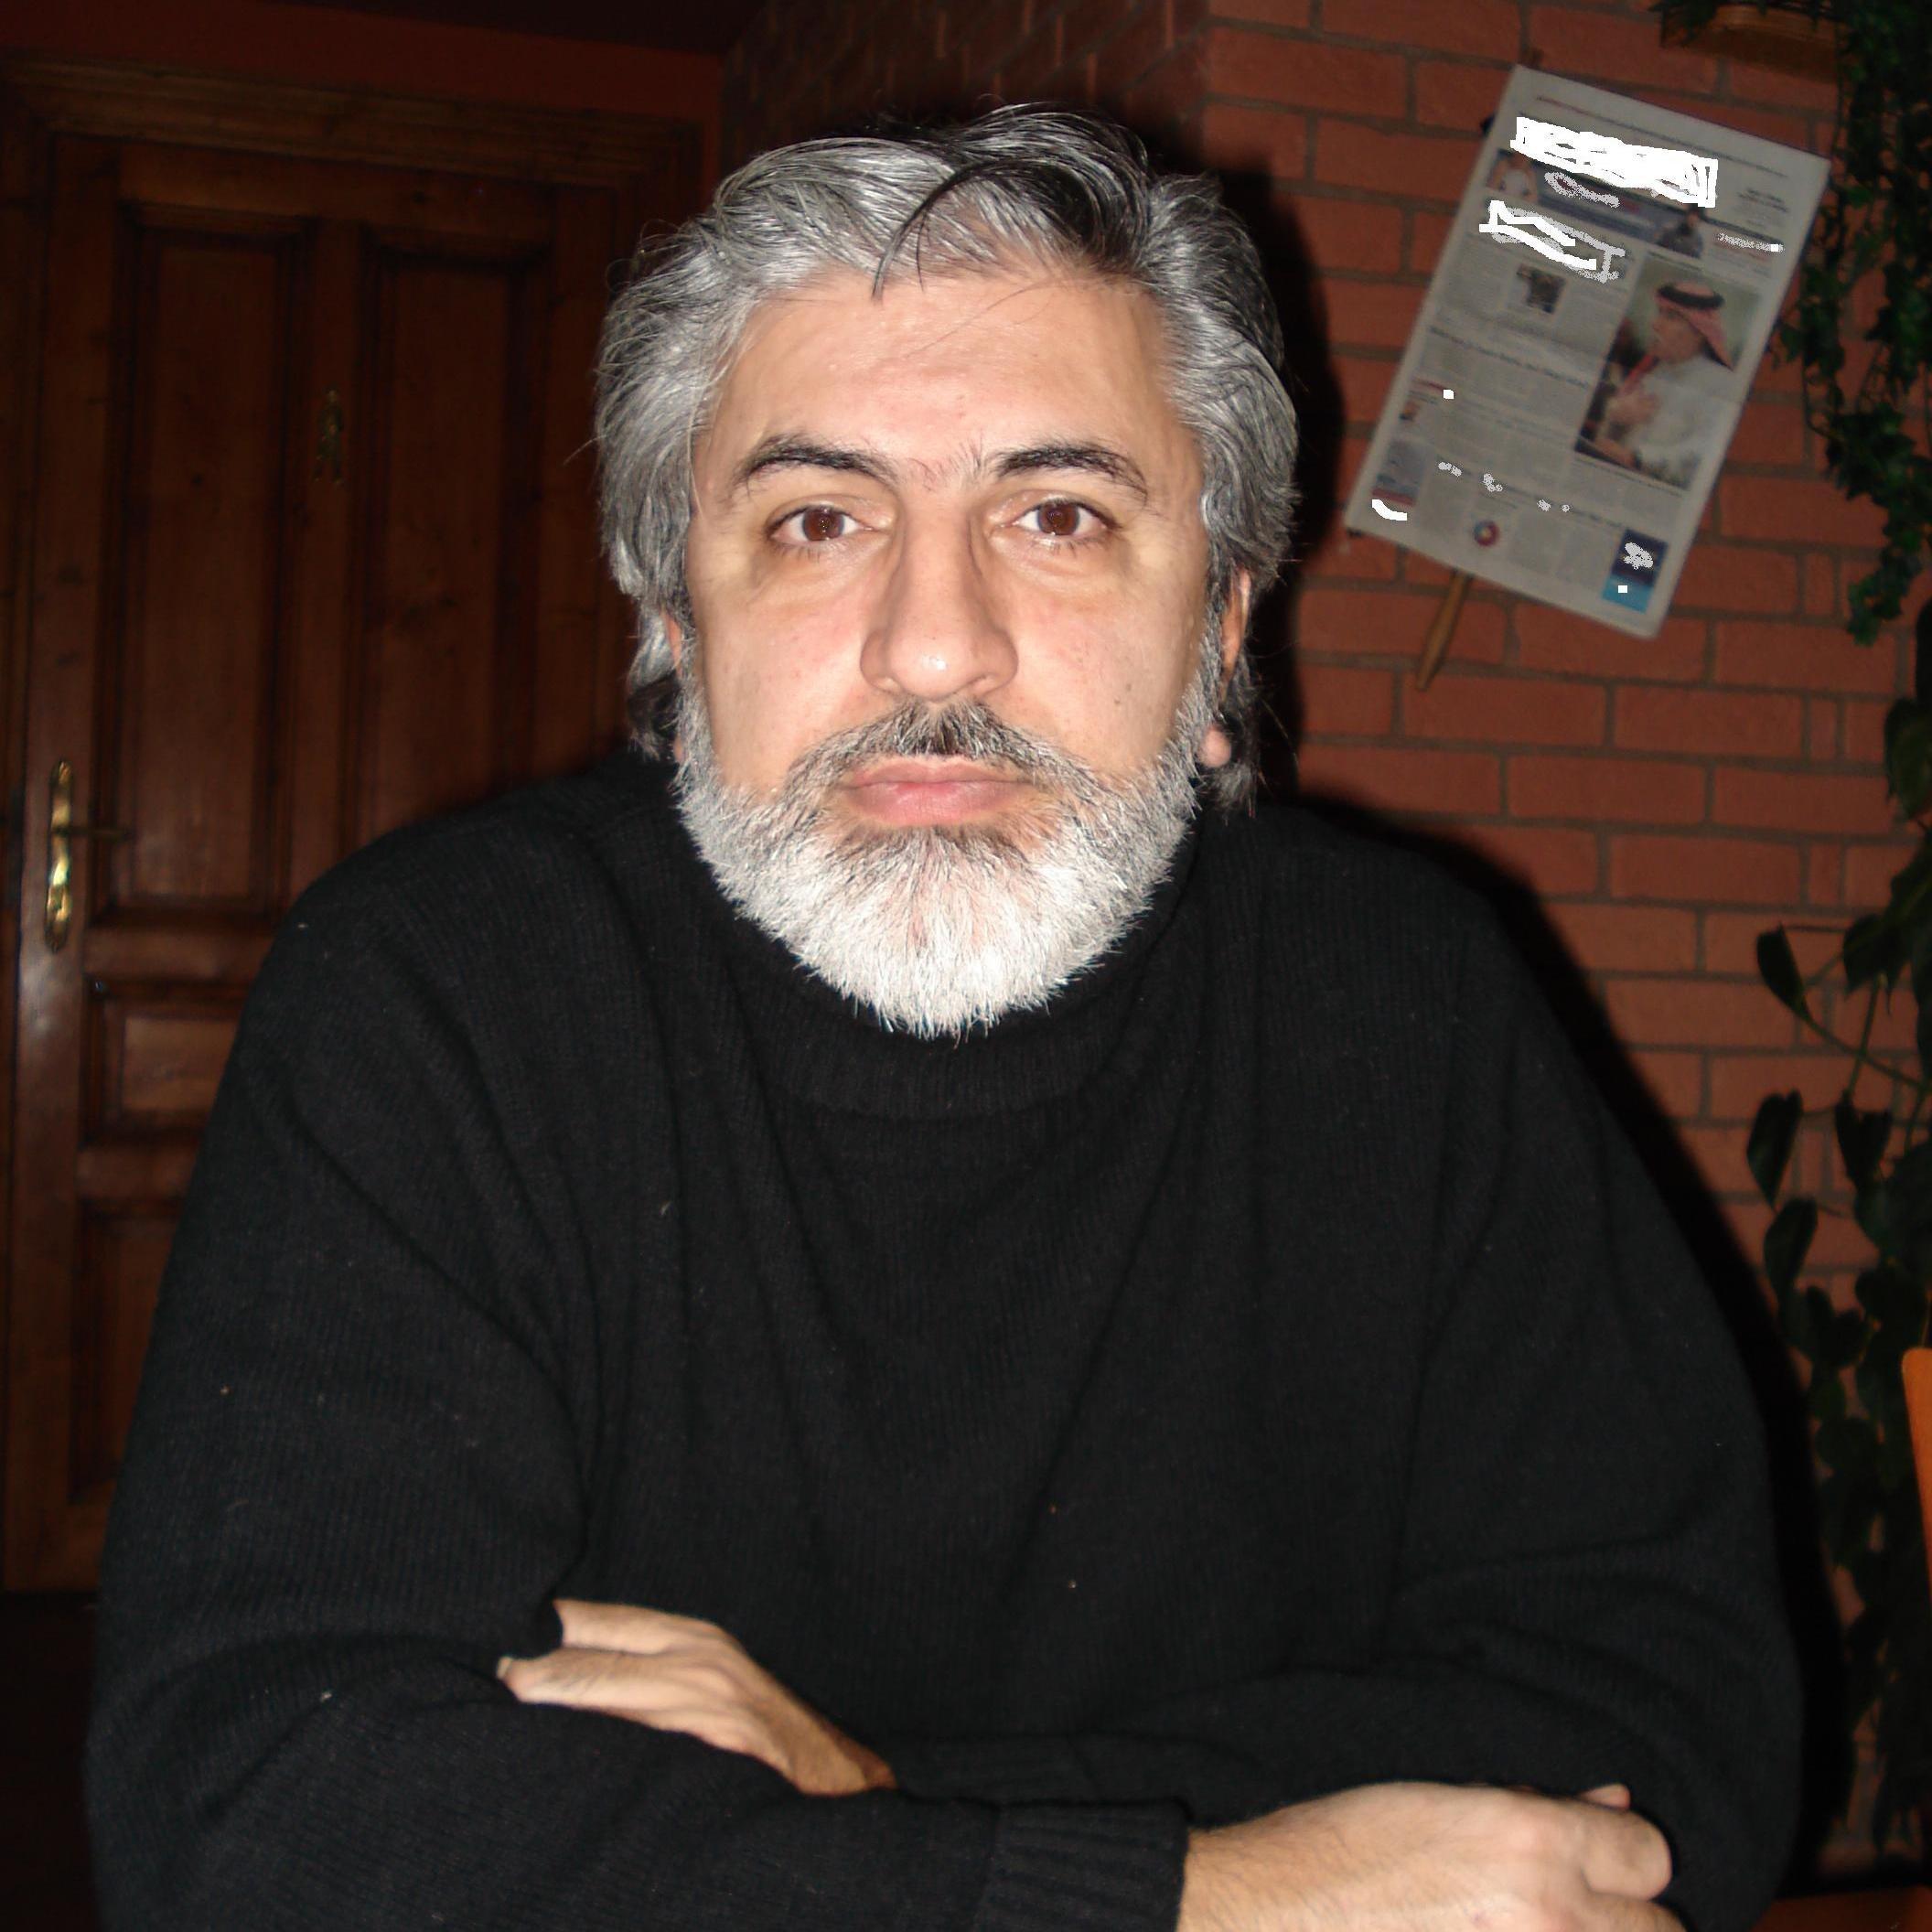 @RajaChemayel